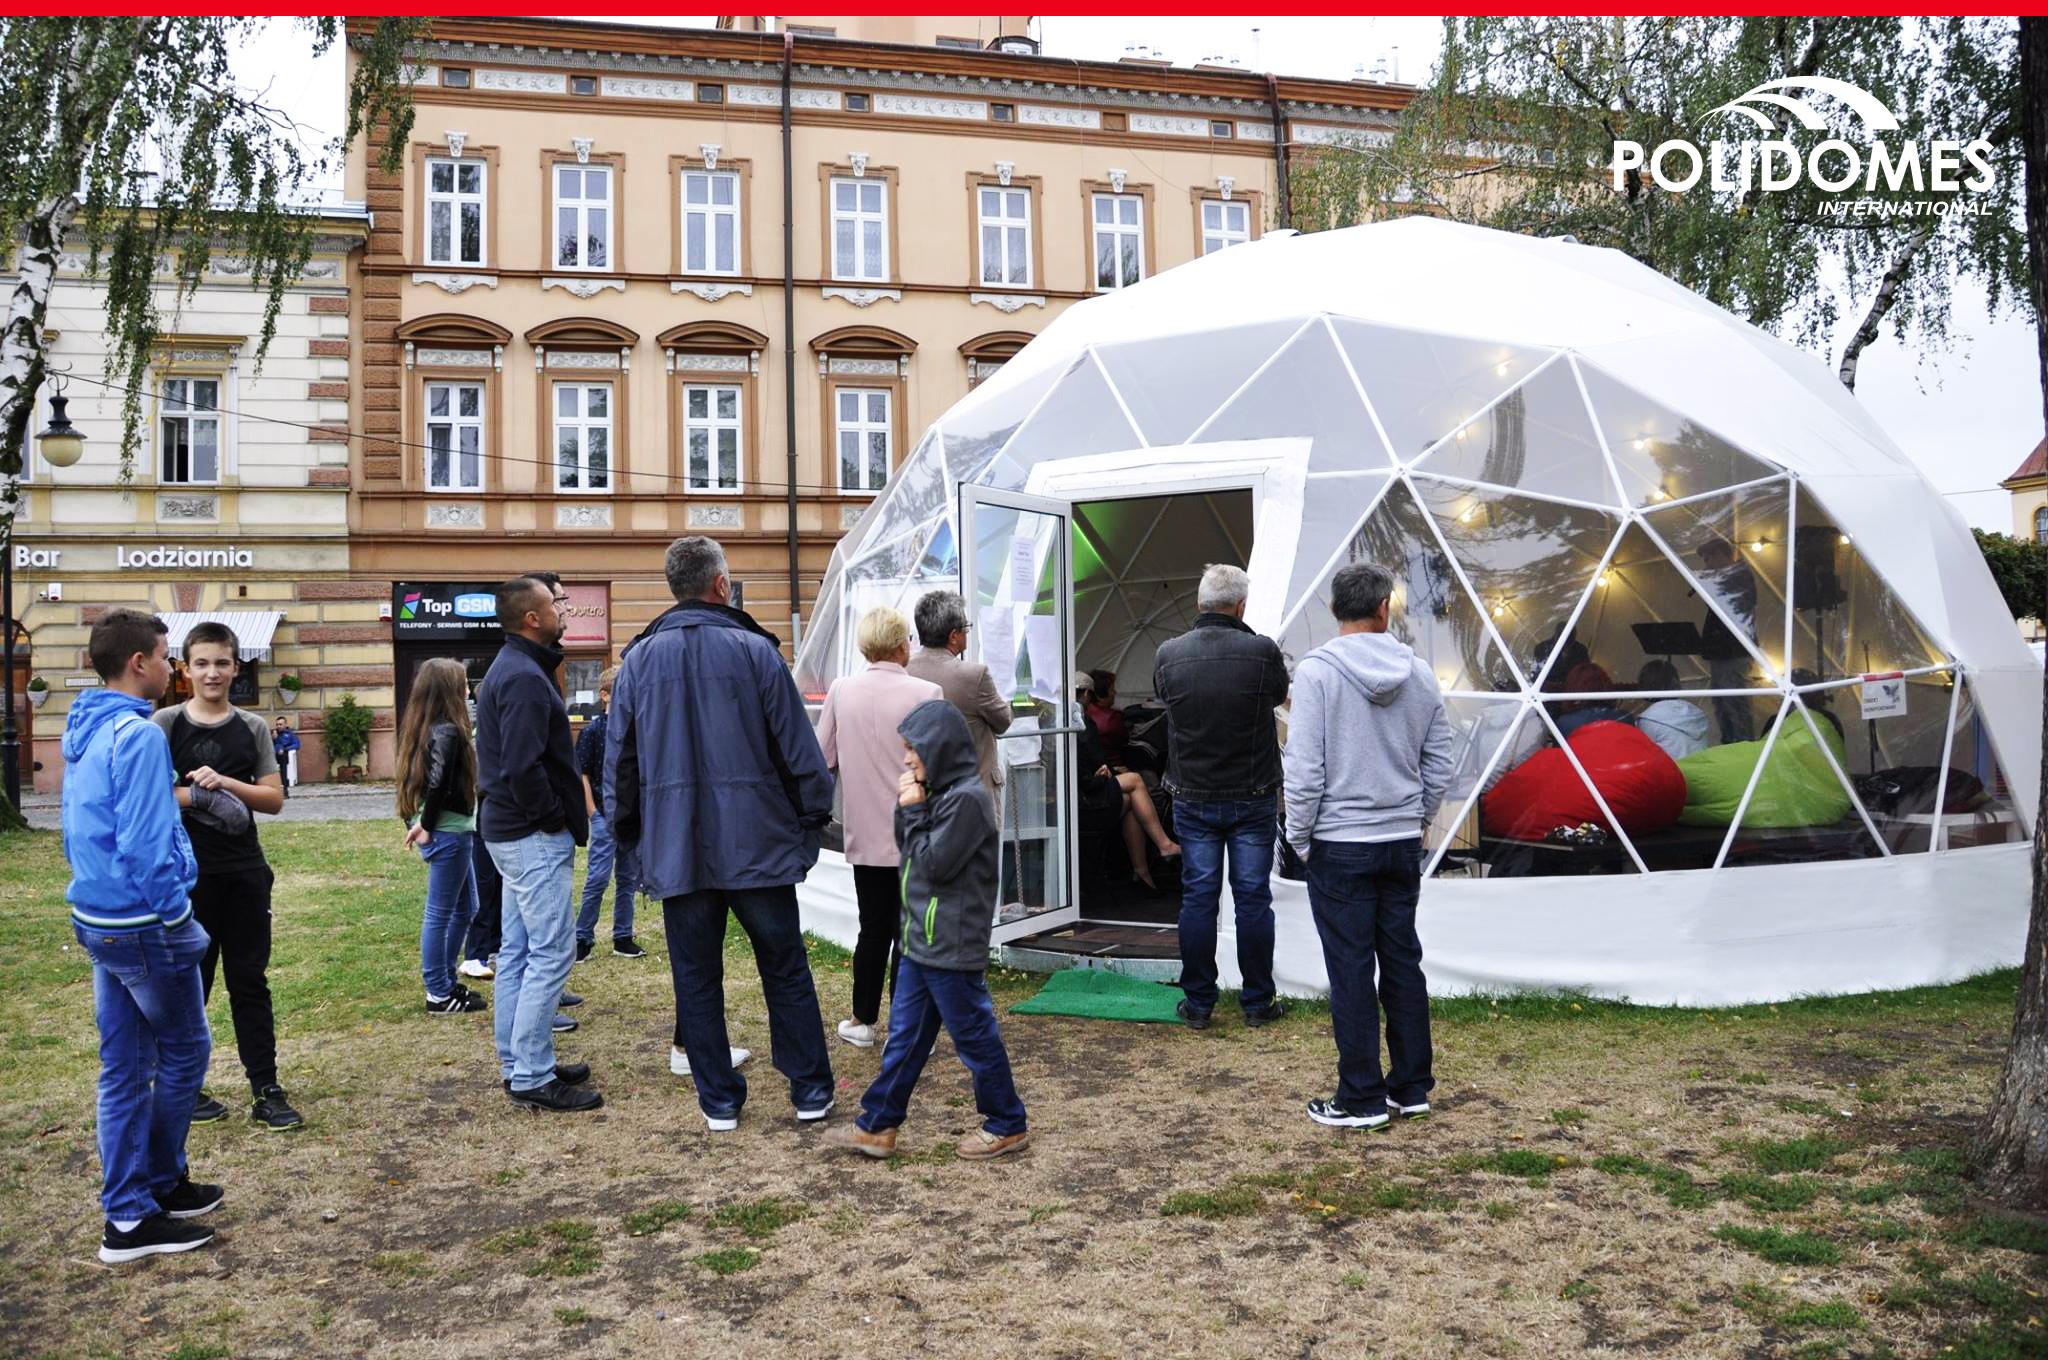 outdoor_event_marketing_tent_logo